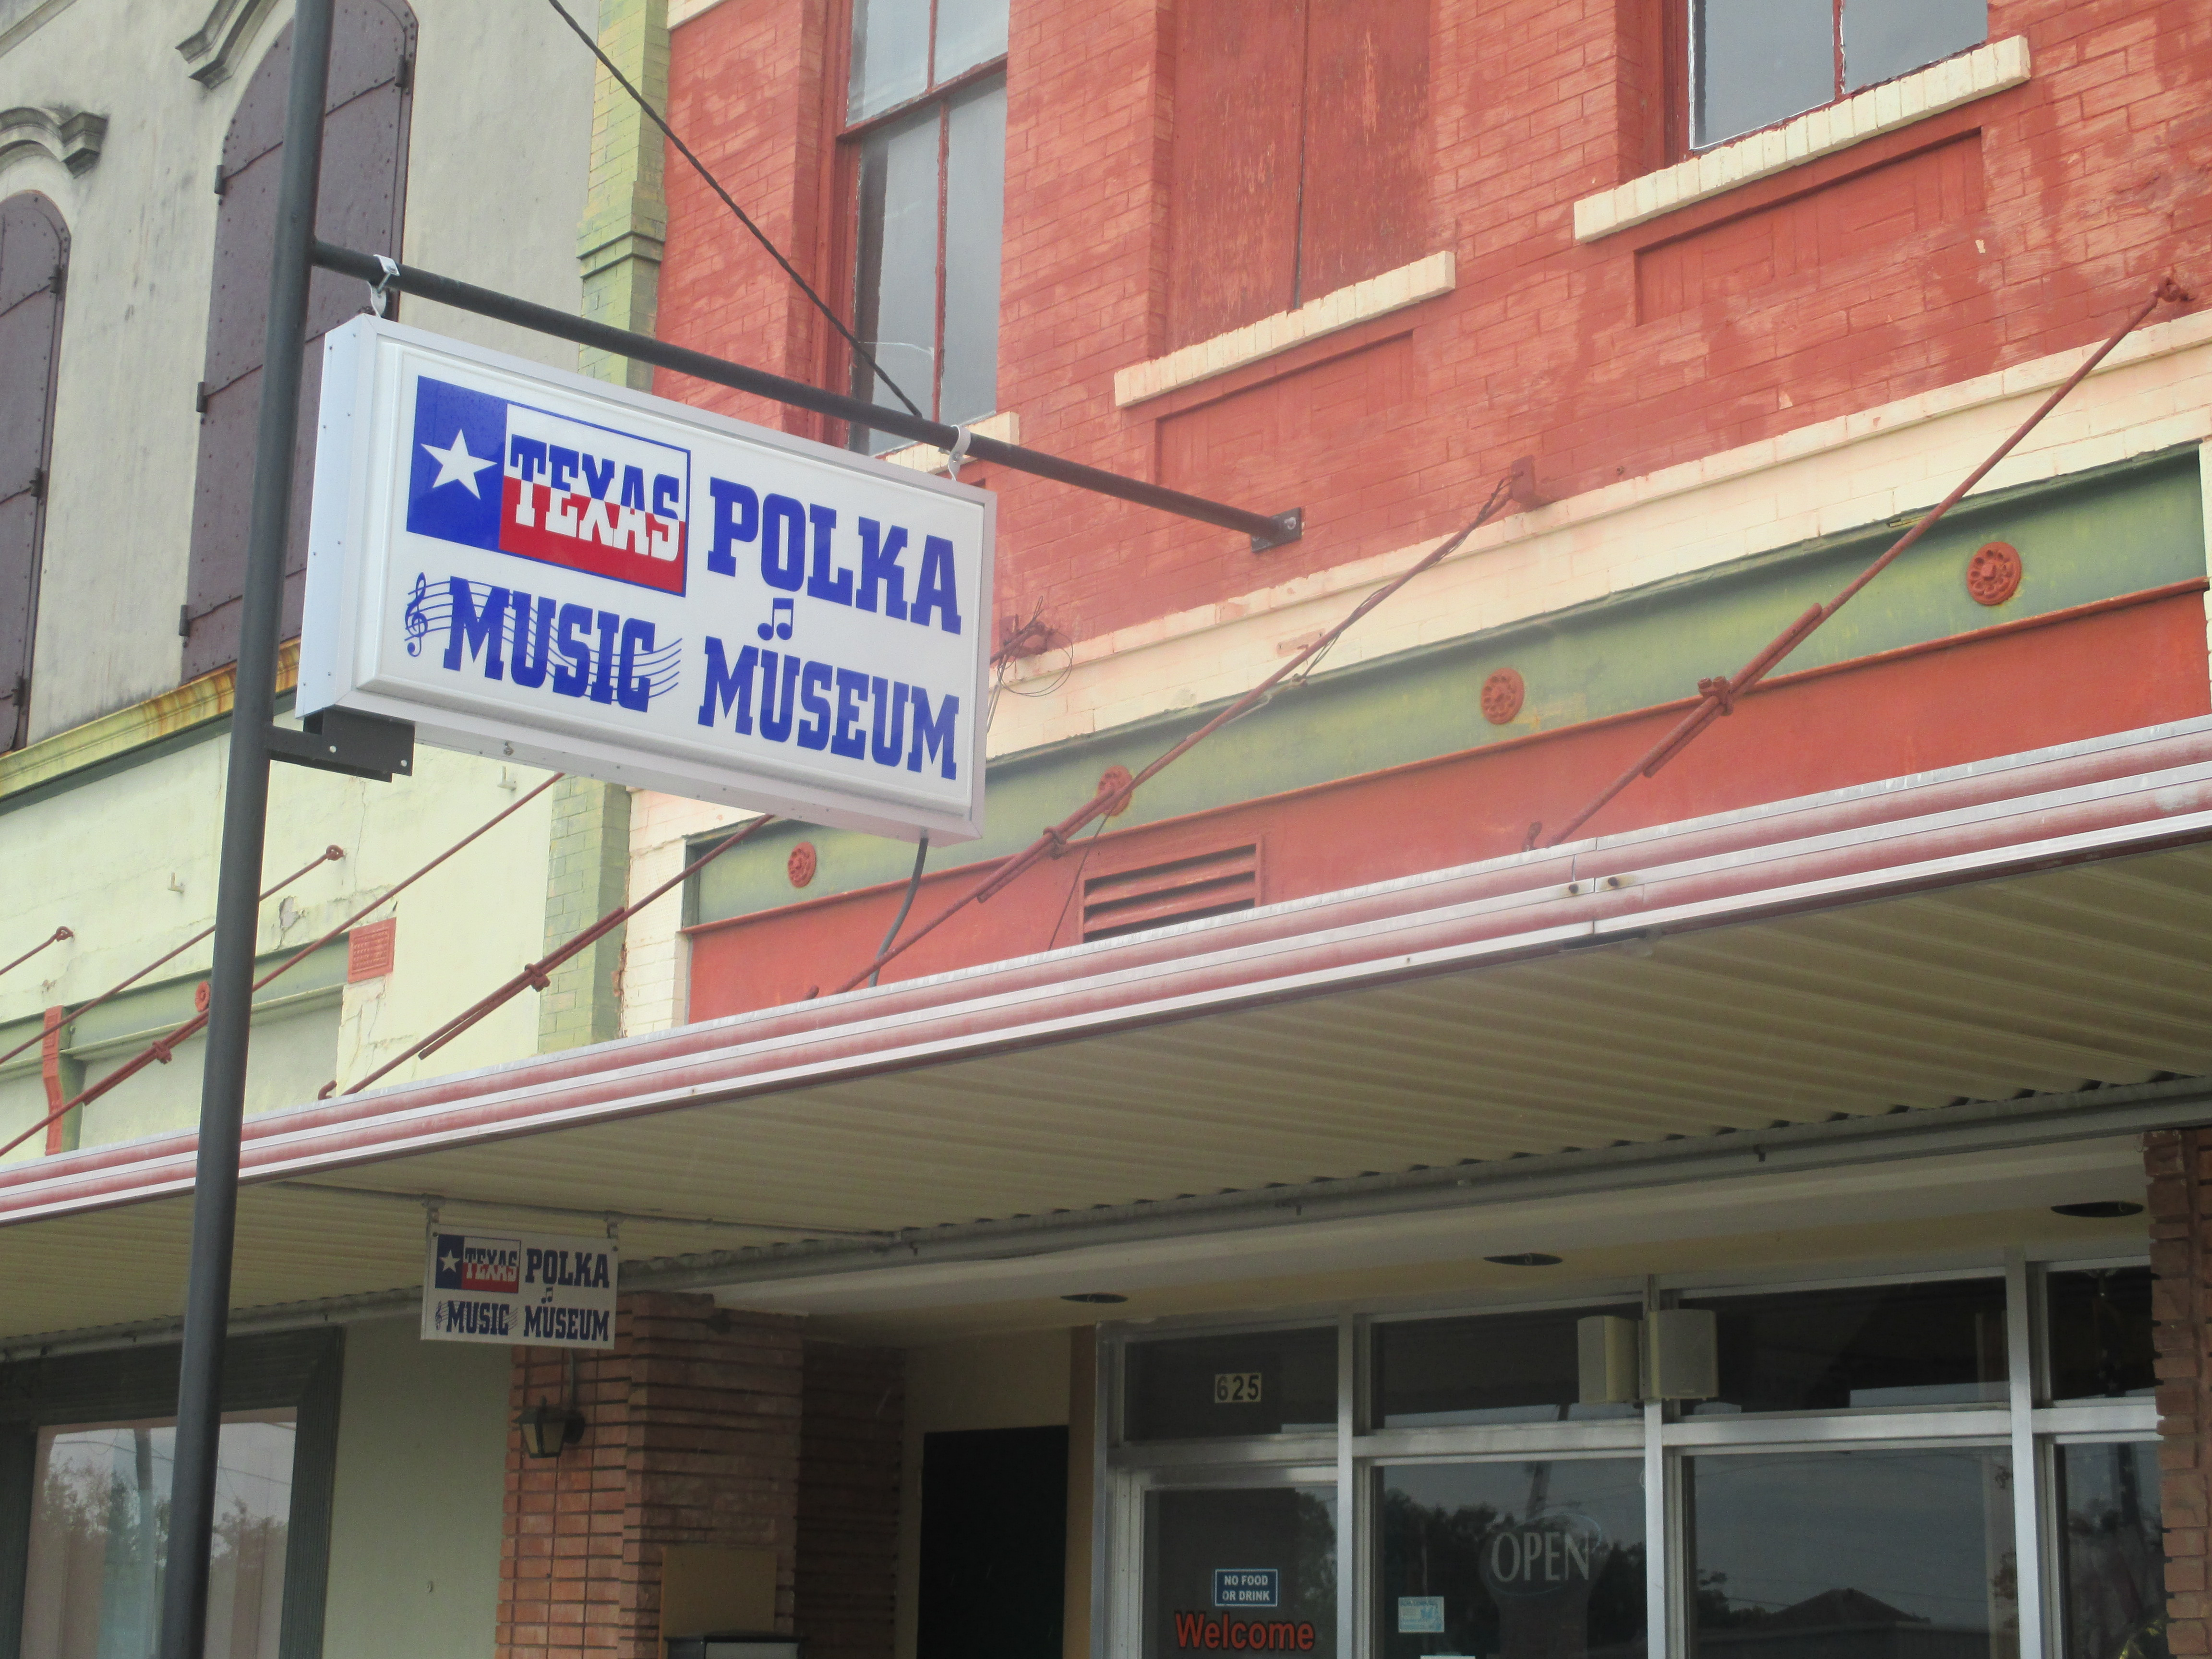 Texas_Polka_Music_Museum,_Schulenburg_IMG_8217